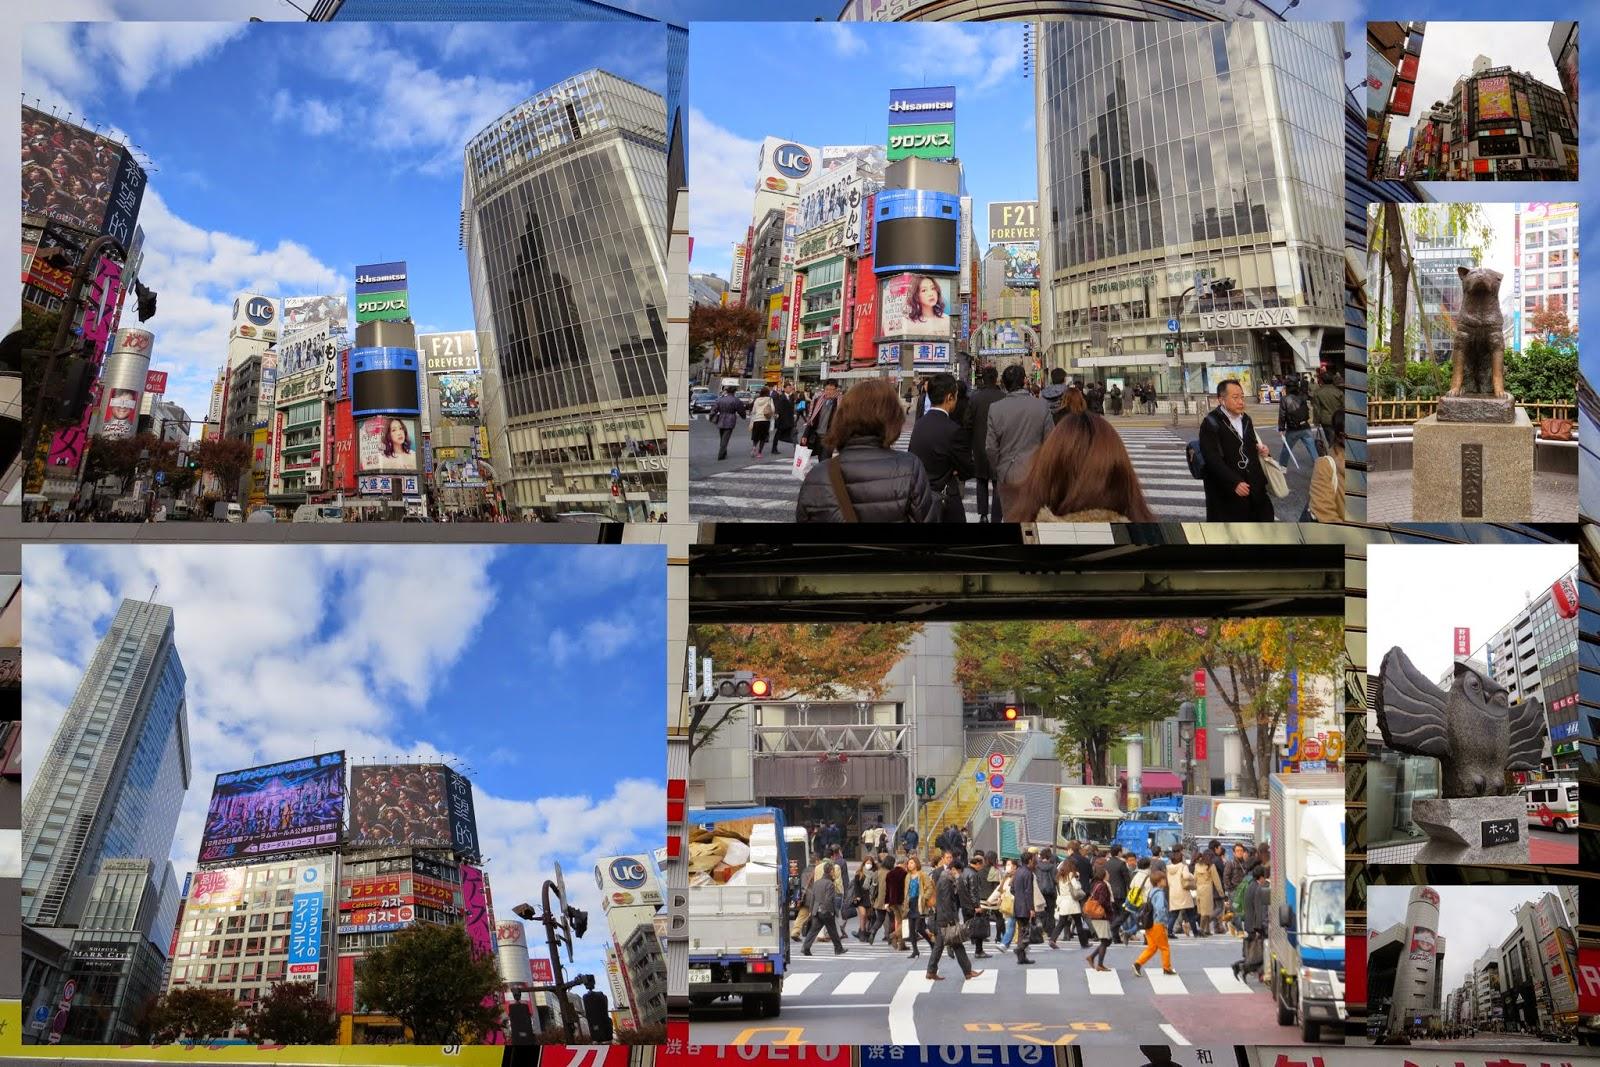 Tokyo districts: Shibuya